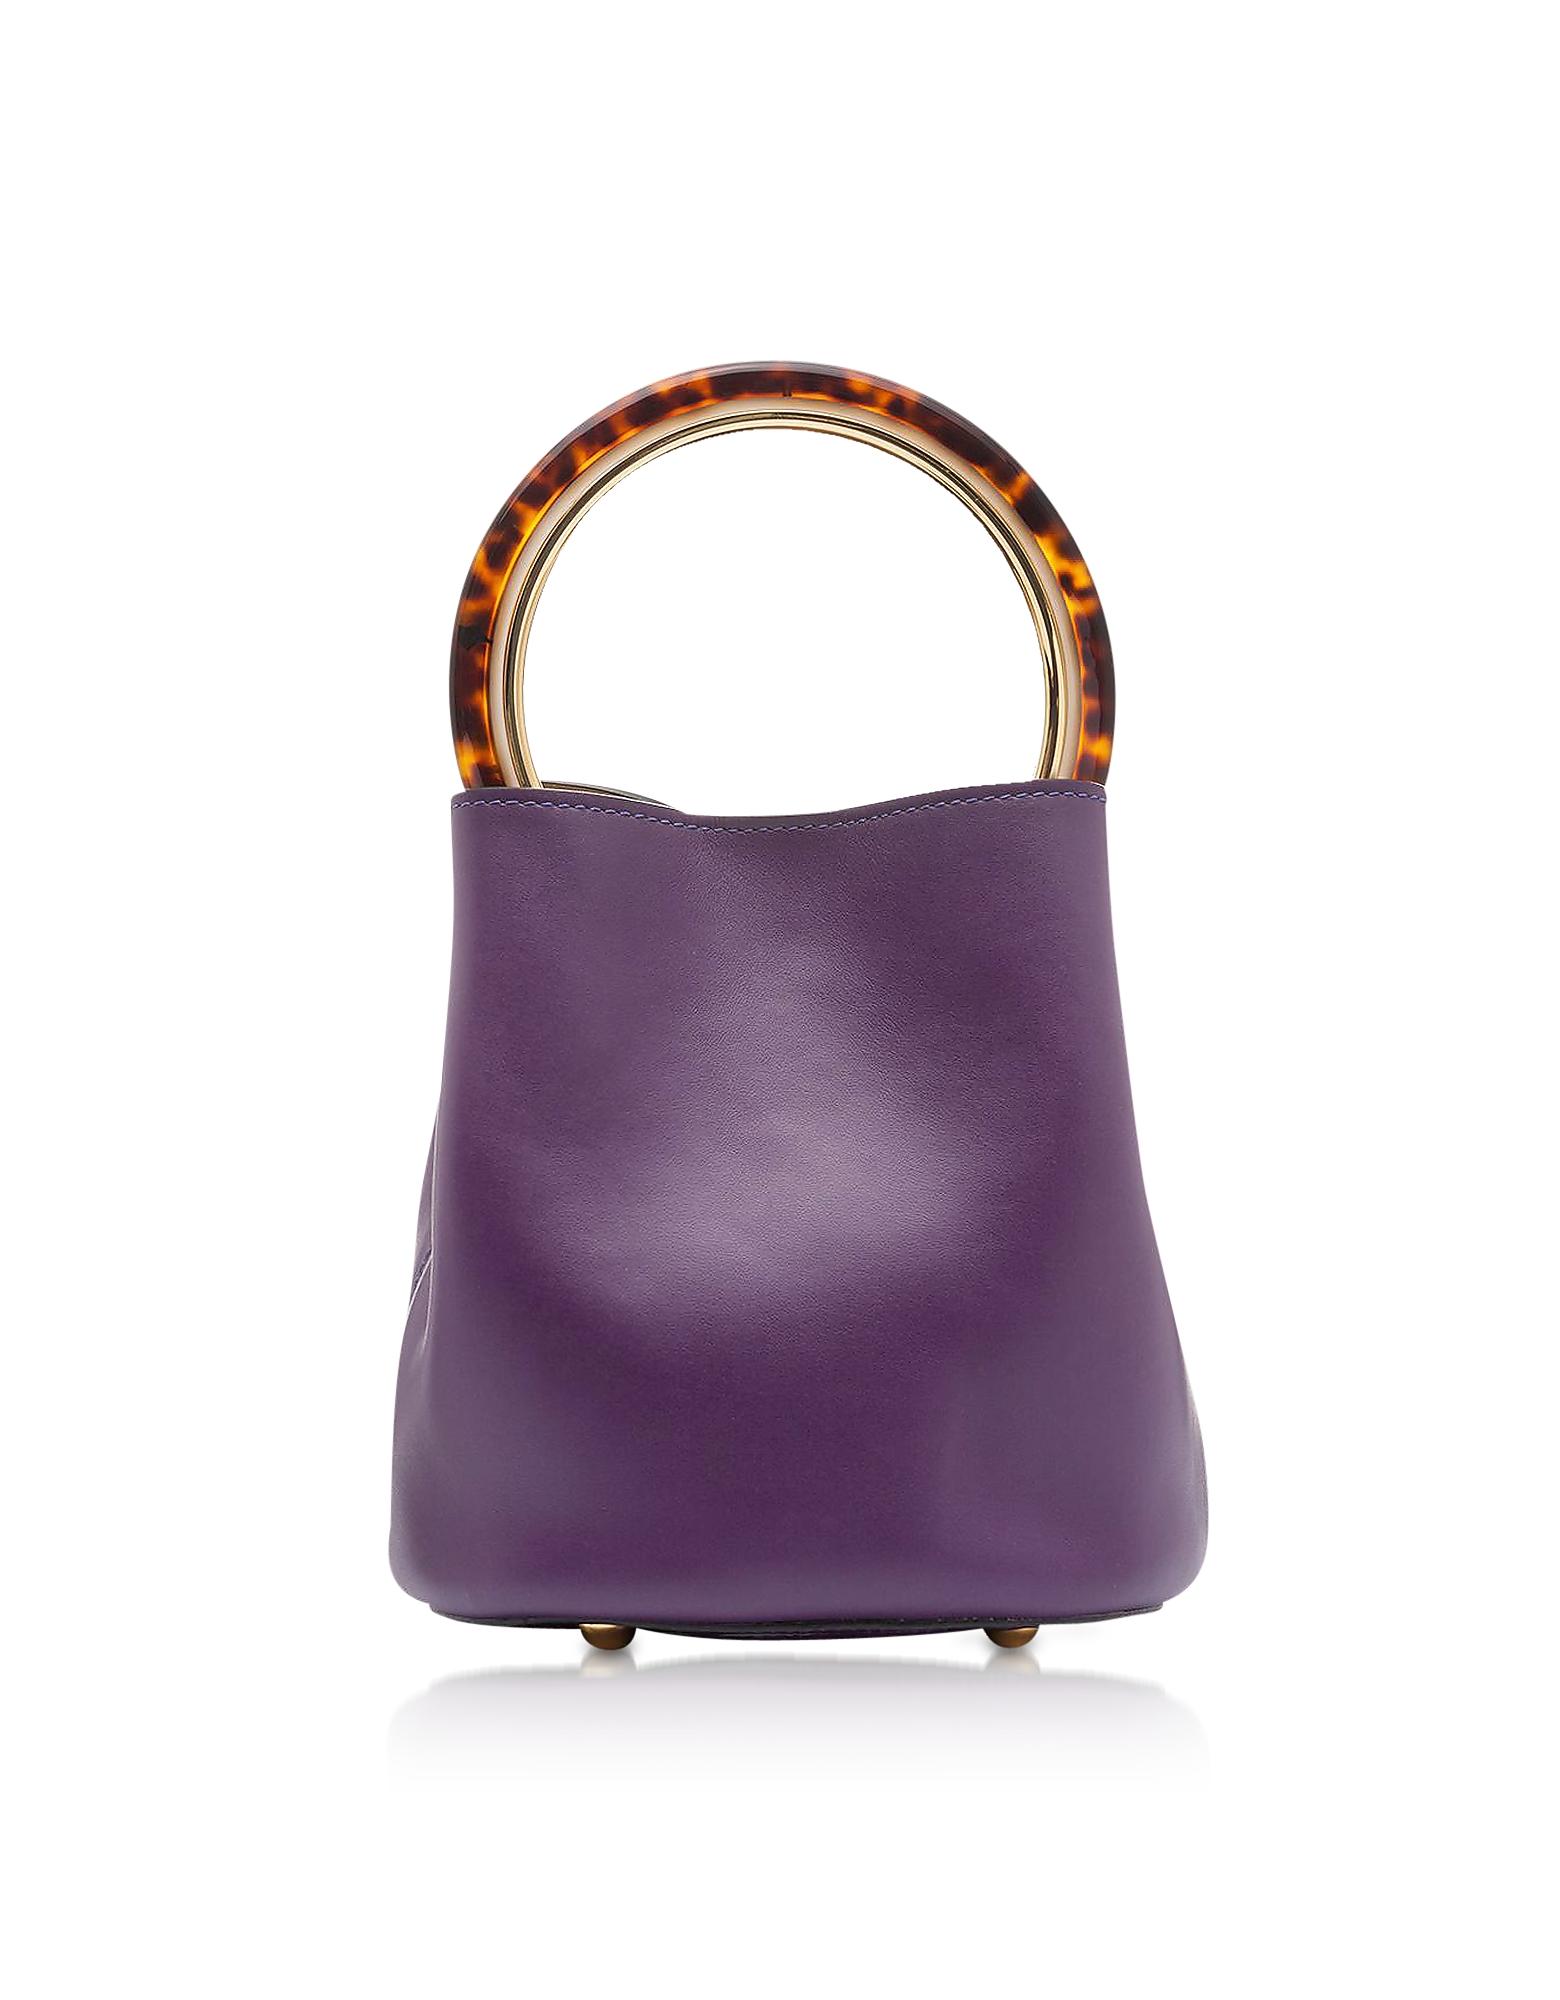 Dark Orchid and Ceramic Calfskin Pannier Bag